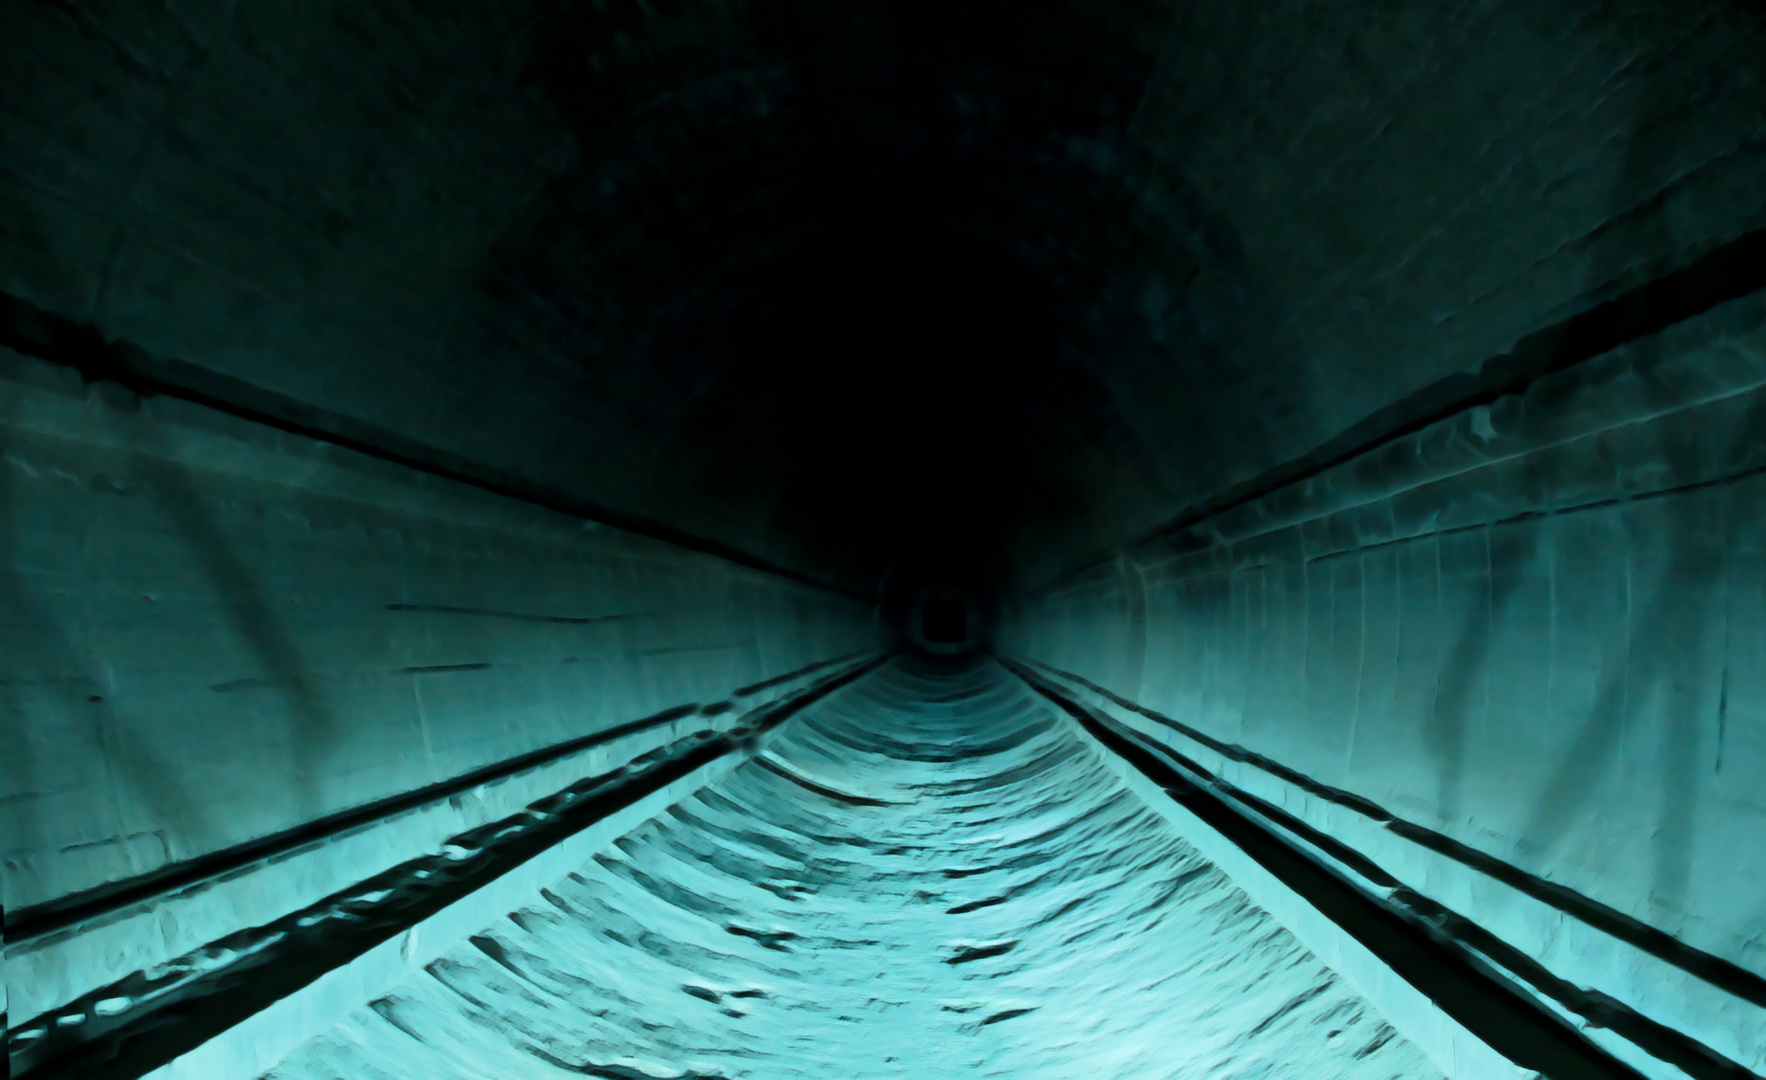 Eisenbahntunnel